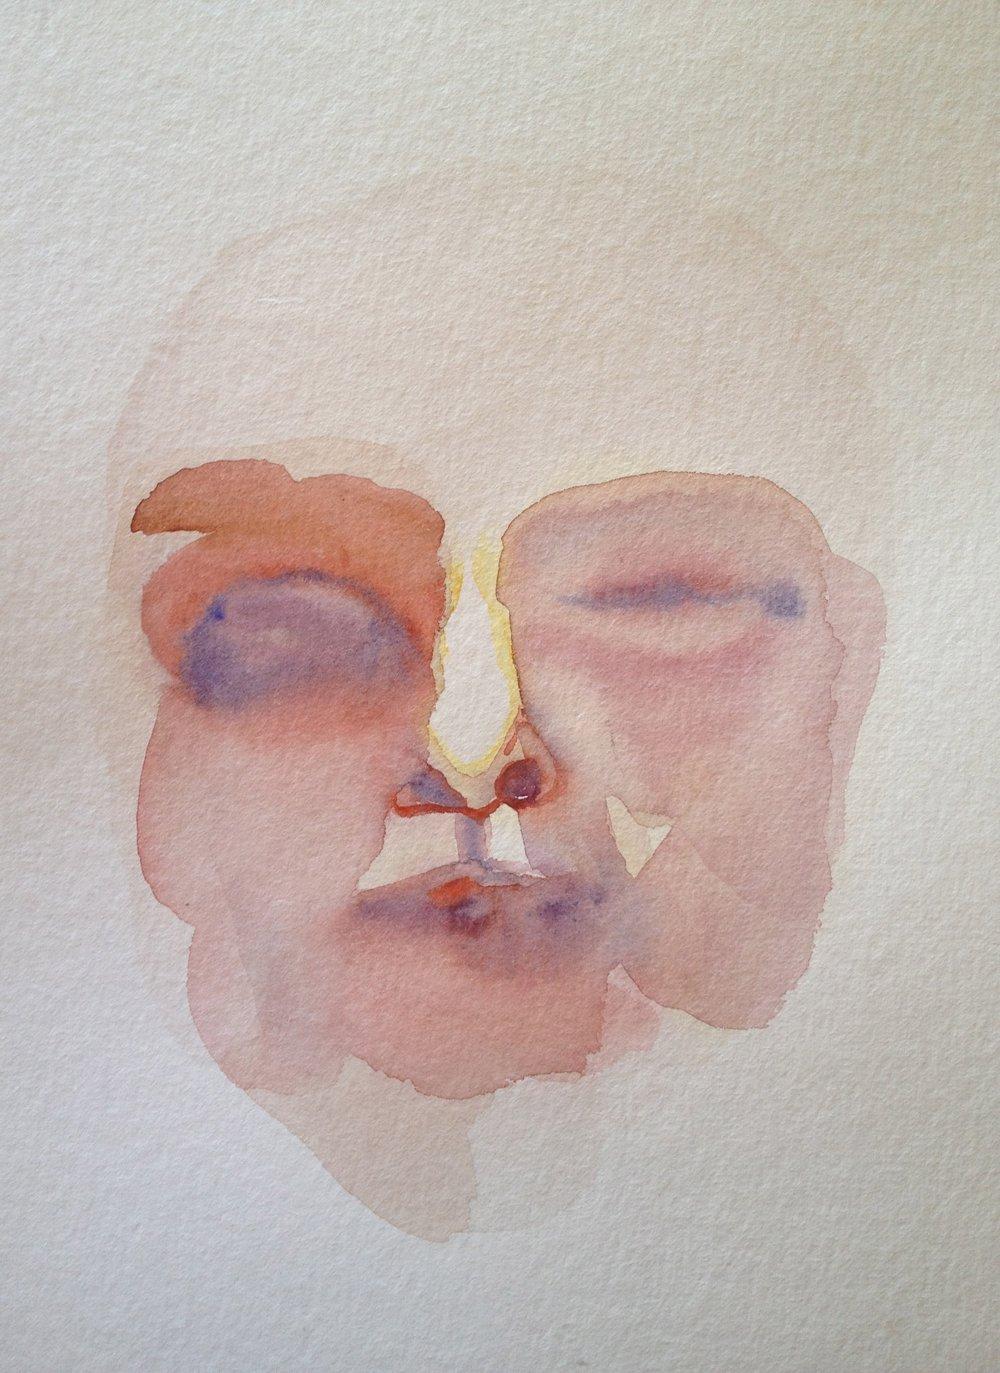 Ohne Titel, Aquarell auf Papier, 21 x 29,7 cm